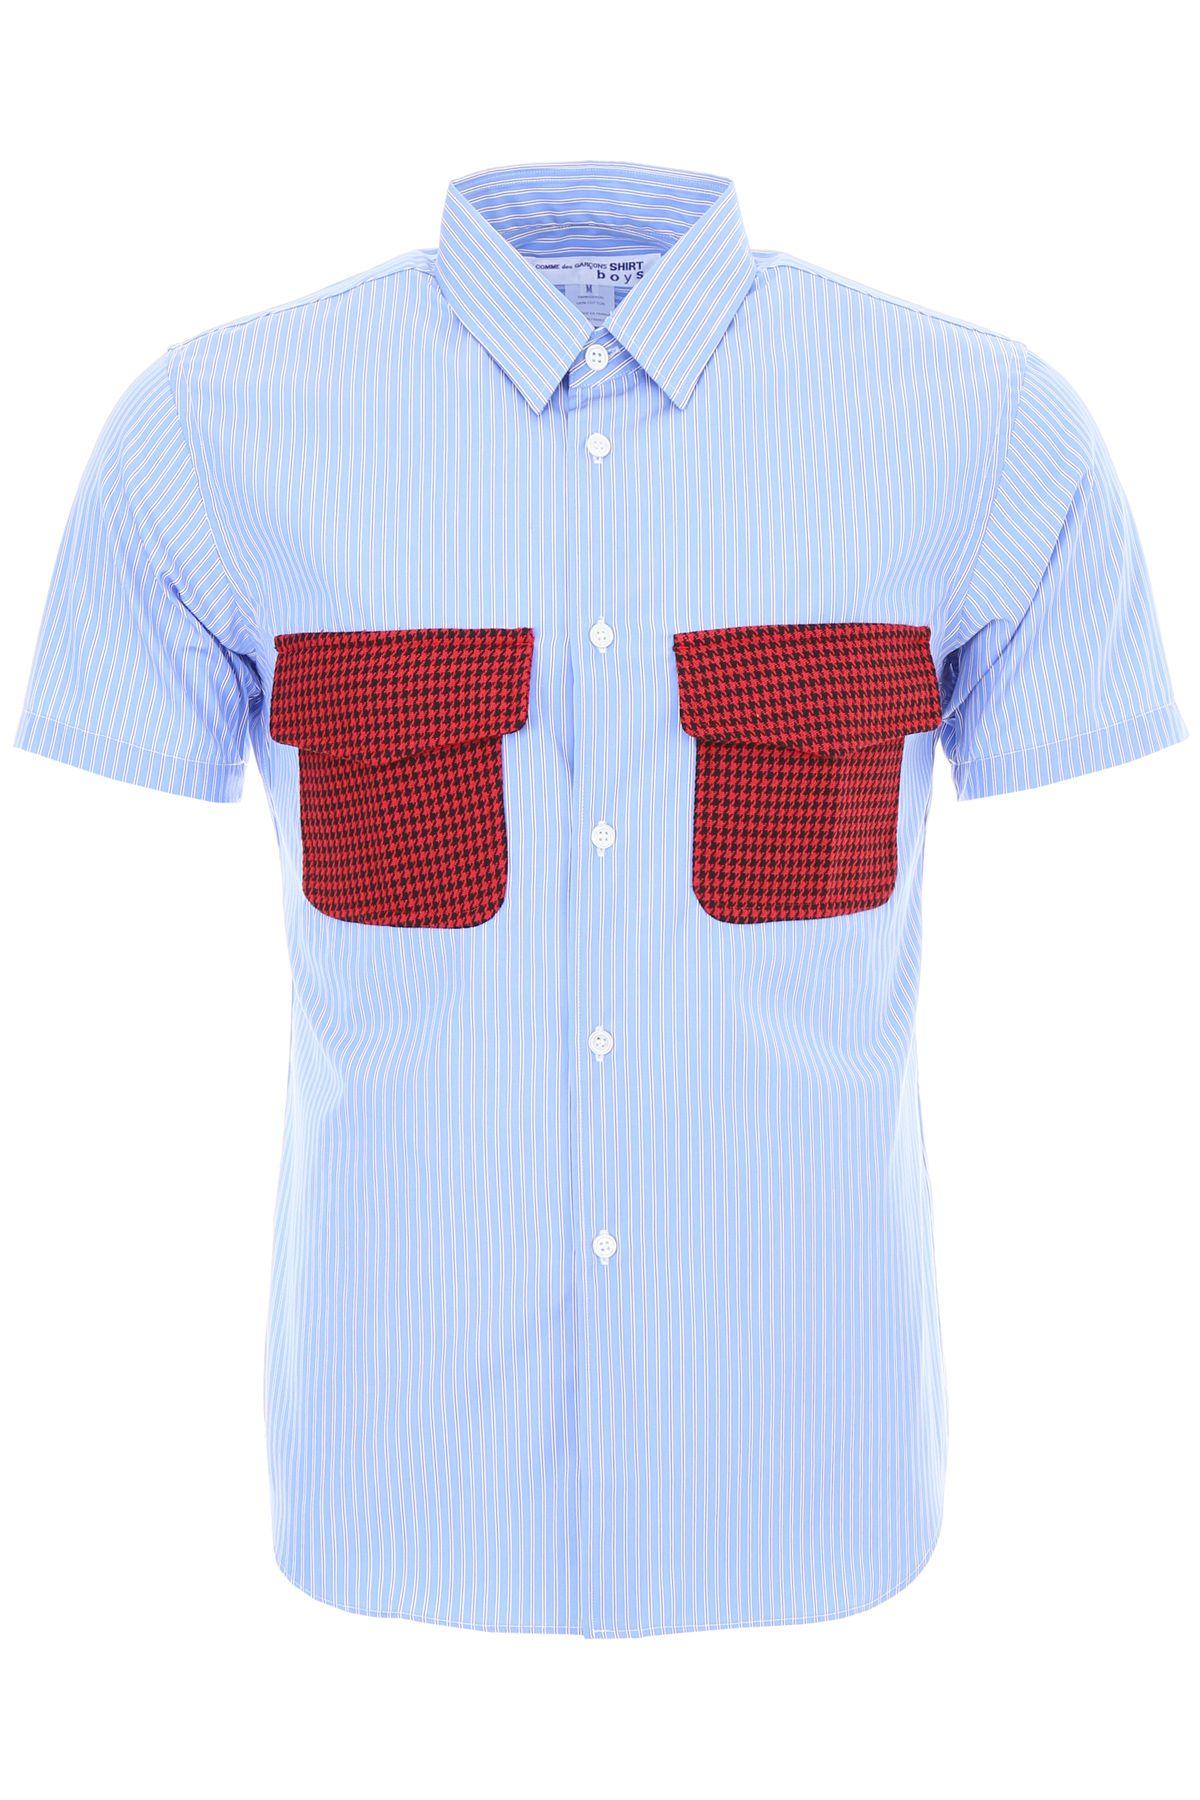 COMME DES GARÇONS BOYS Unisex Striped Shirt in Blu Red Black